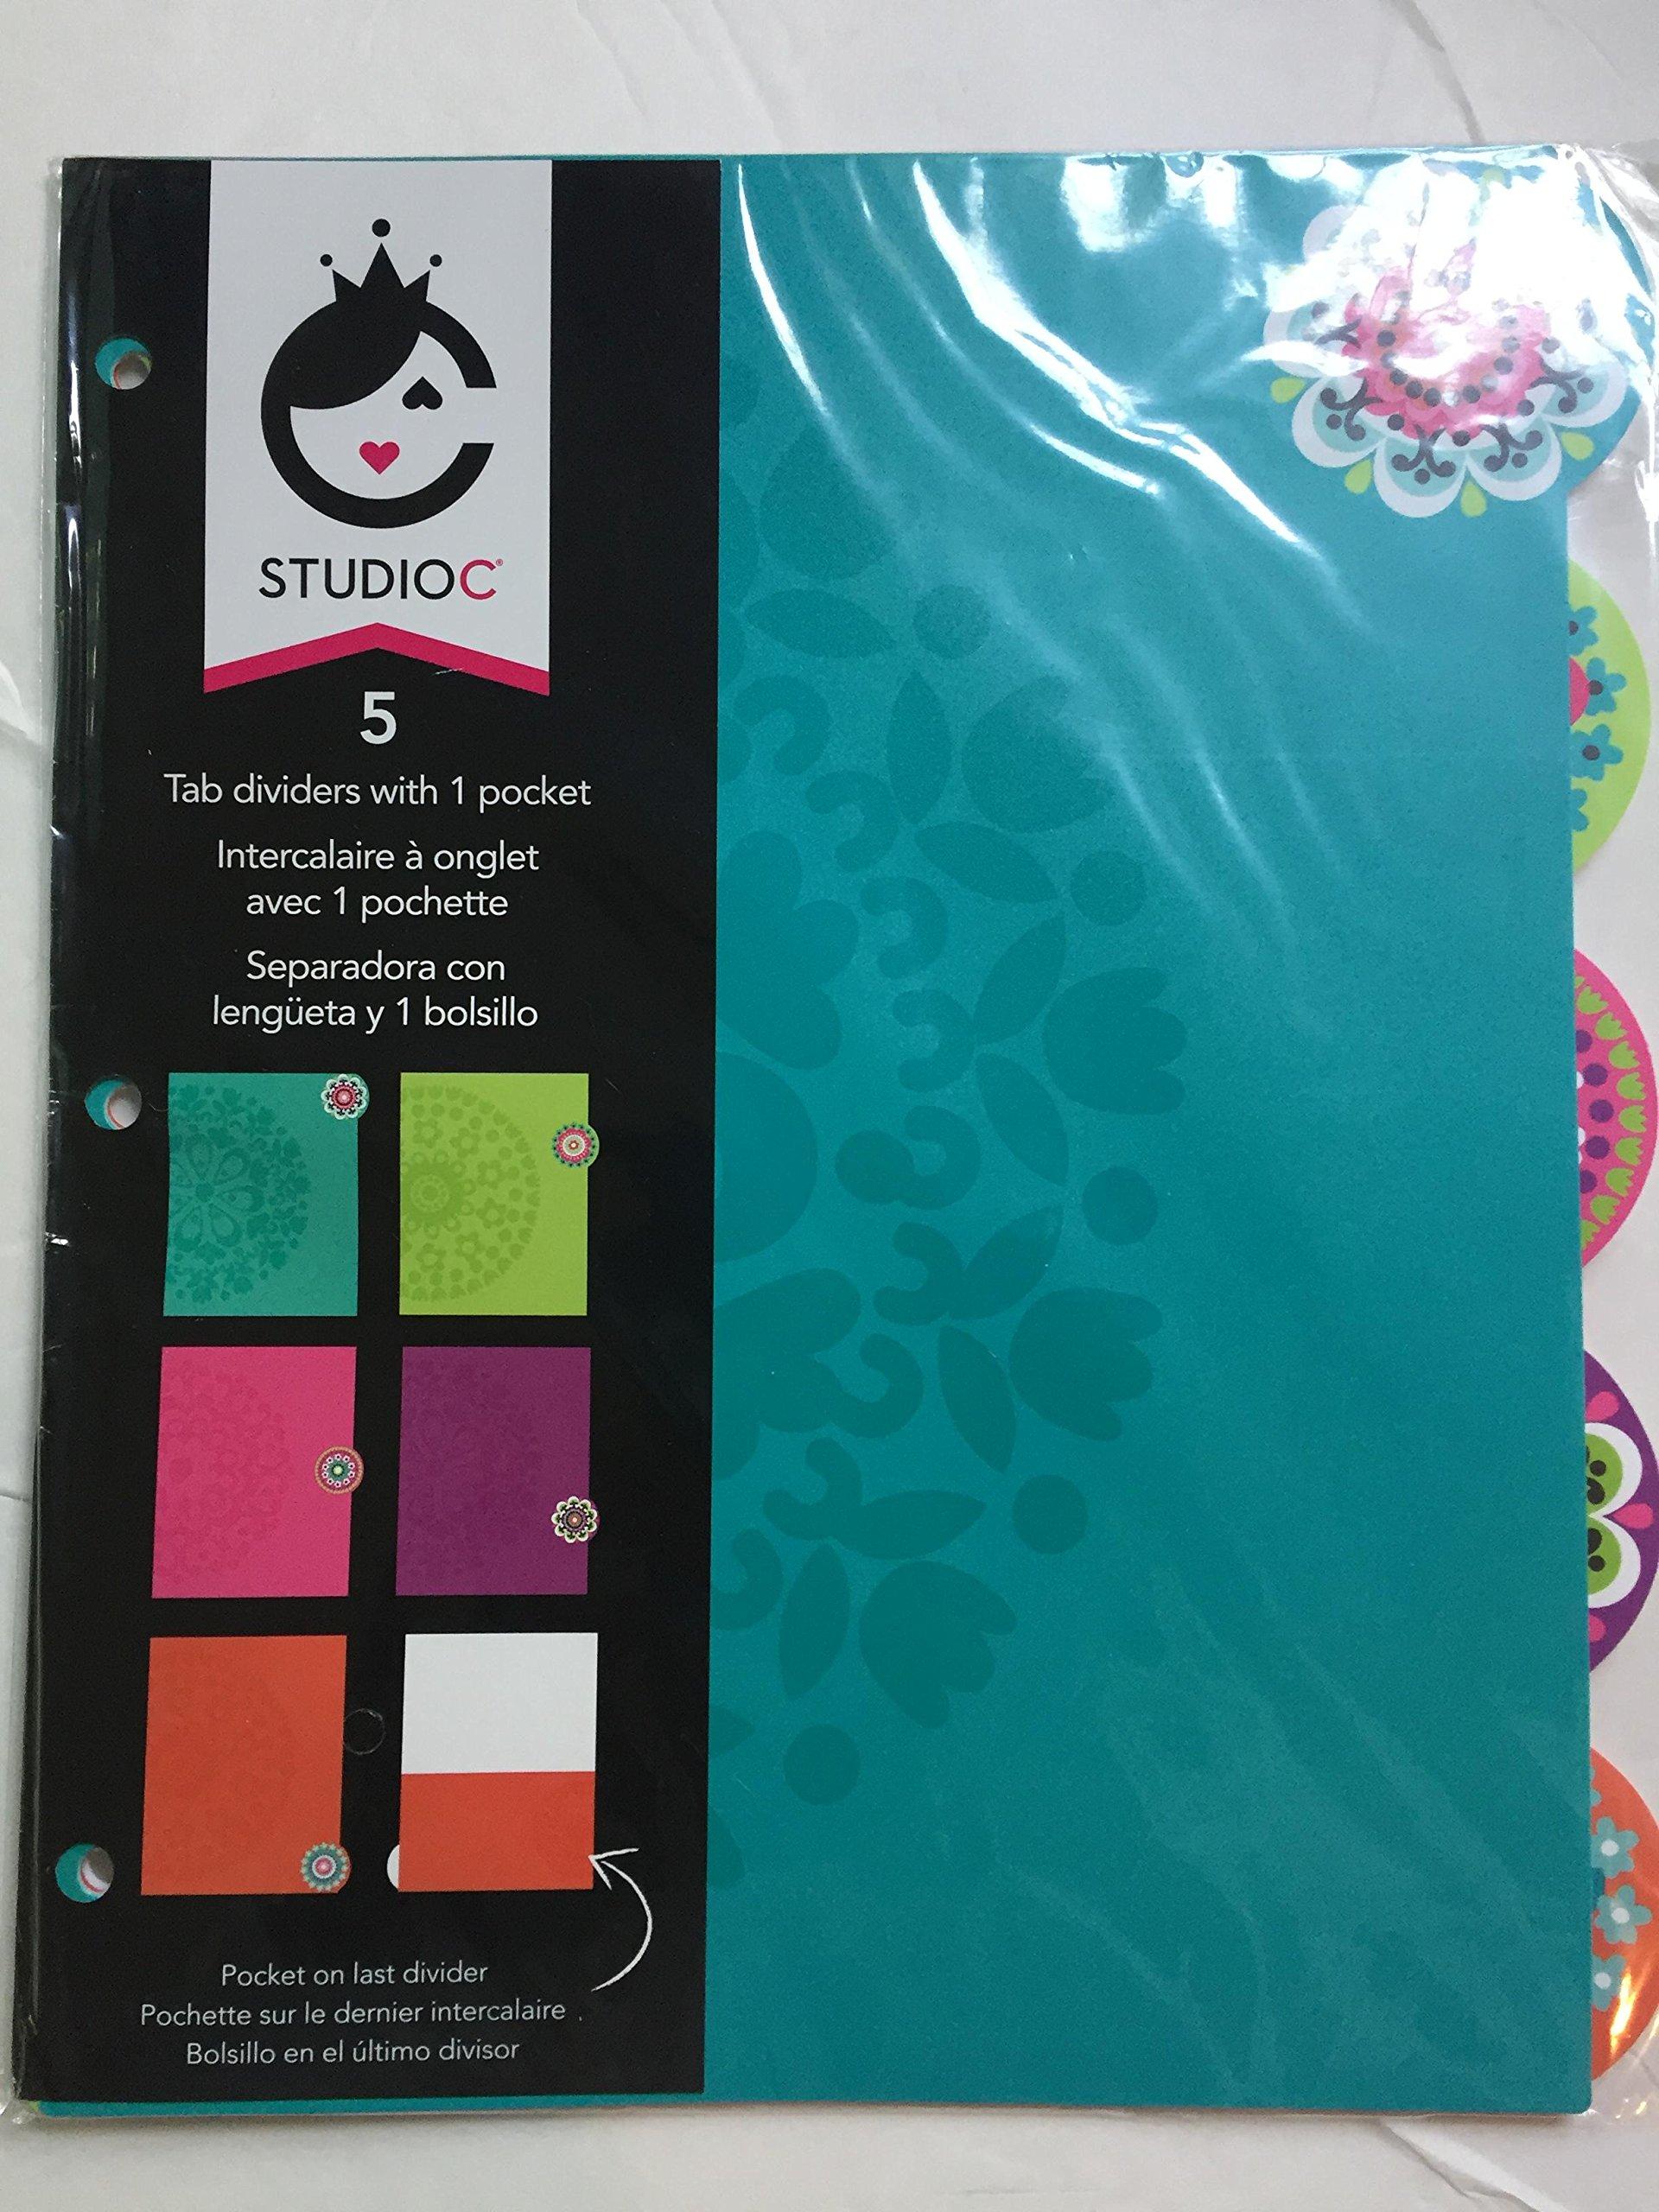 Carolina Pad Studio C Tab 5 Dividers 1 Pocket Kaleidoscope Collection